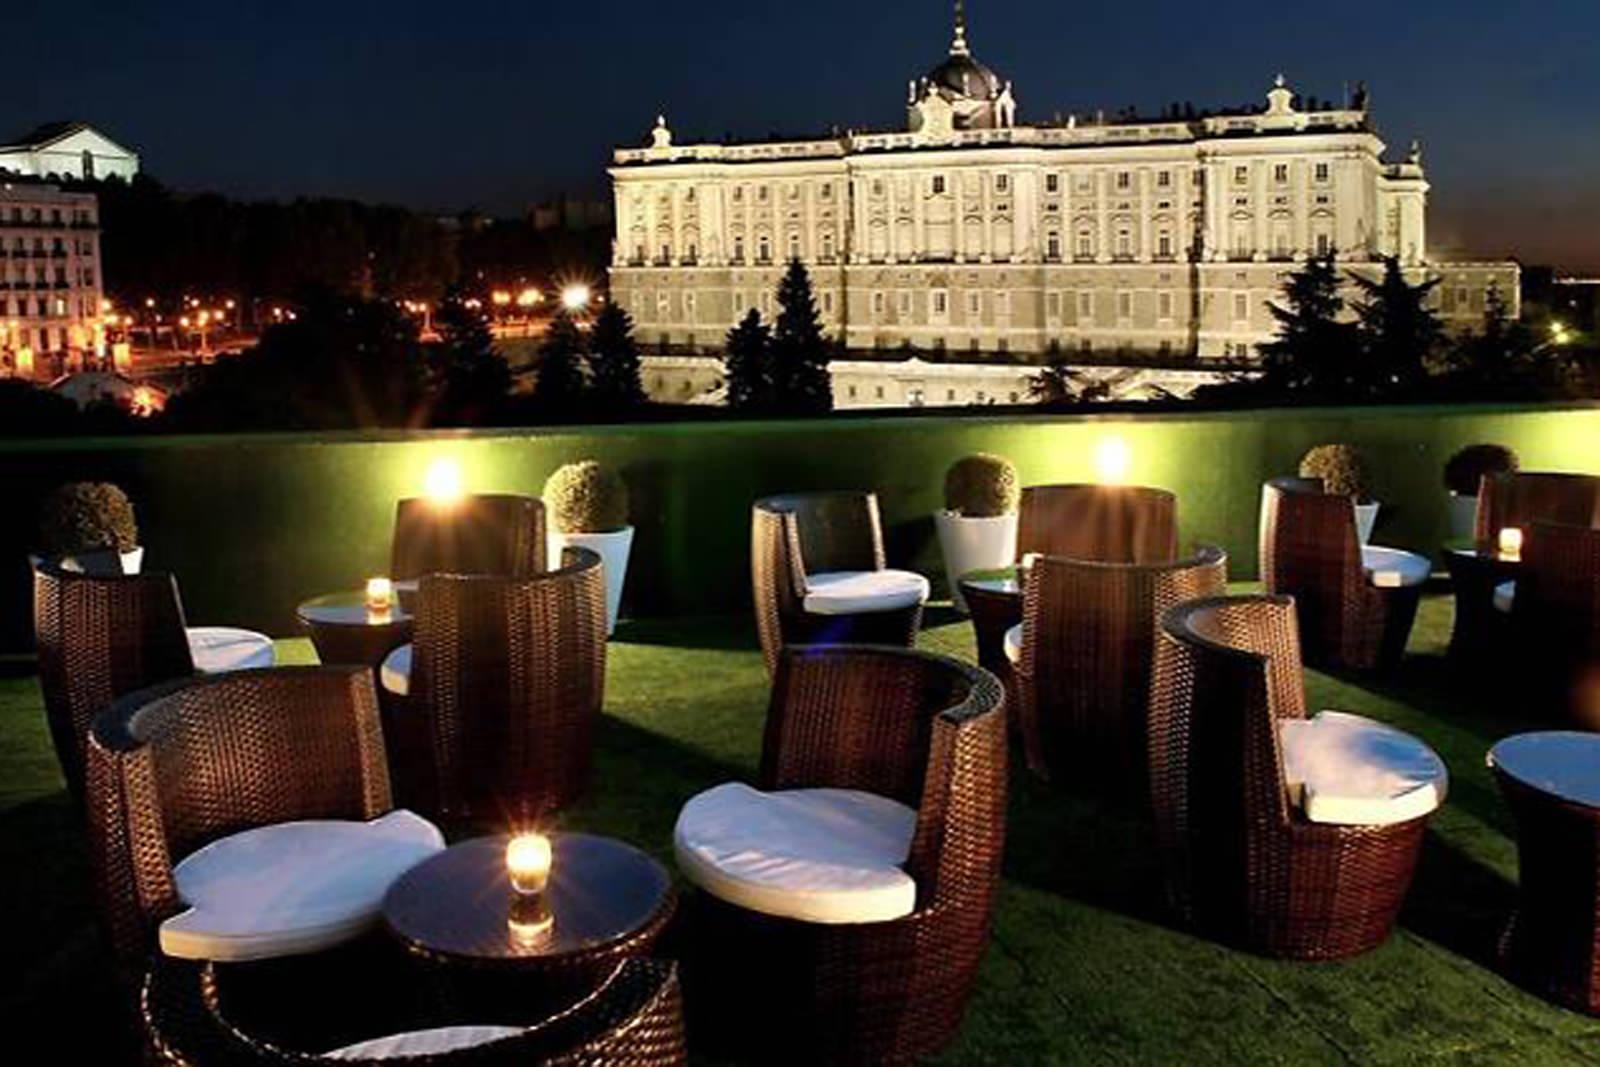 Madrid cool blog terrazas jardines de sabatini g madrid for Terrazas sodimac 2016